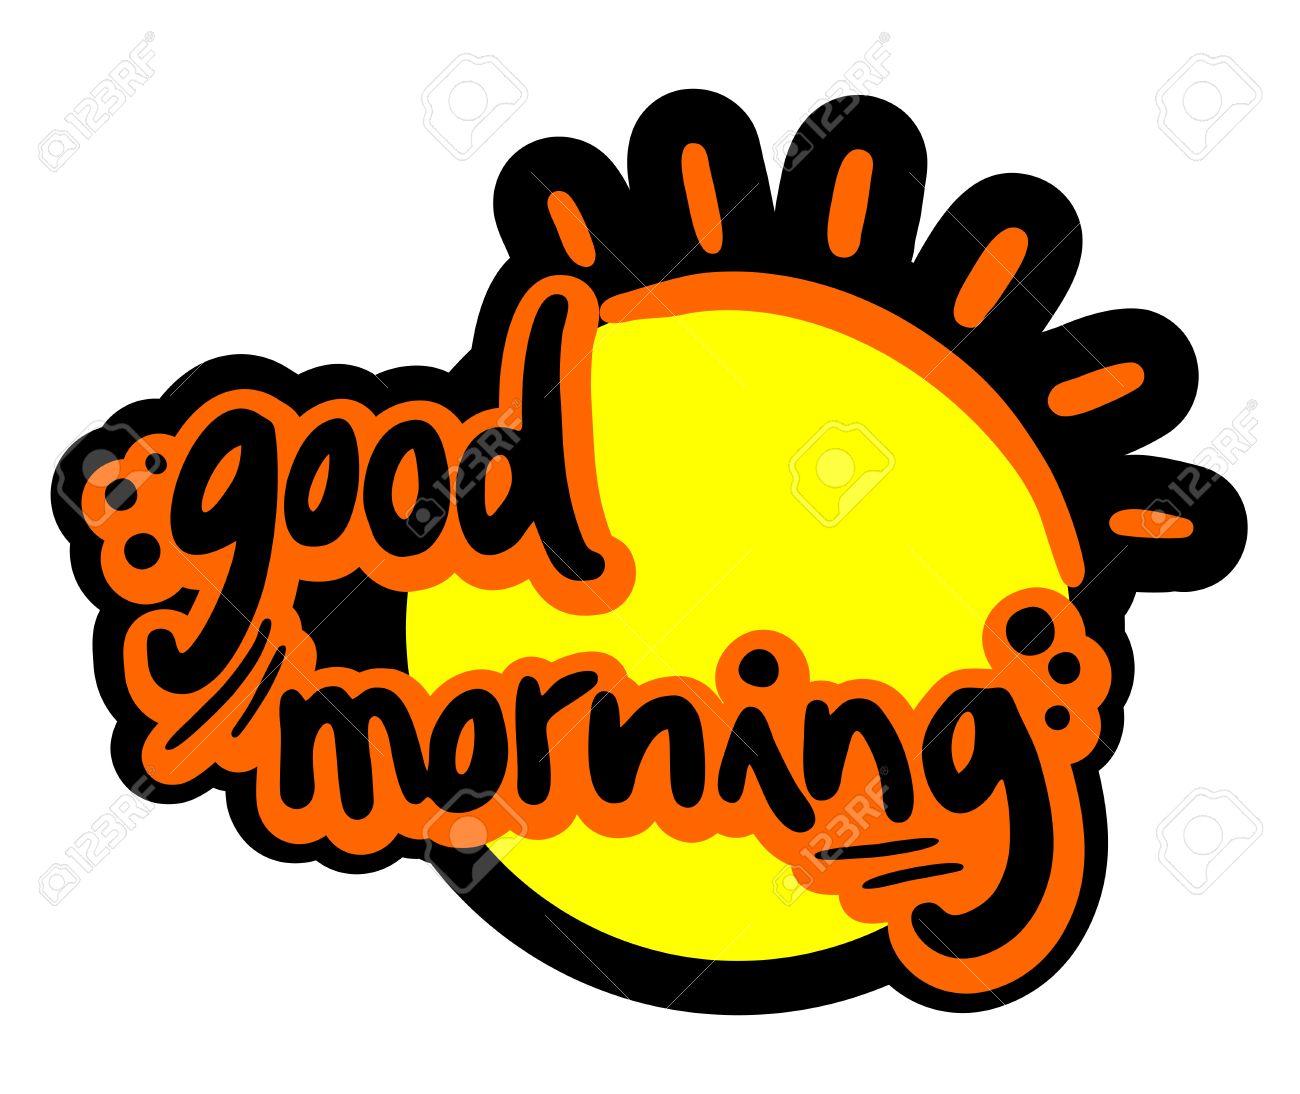 Good morning sun Stock Vector - 16974280